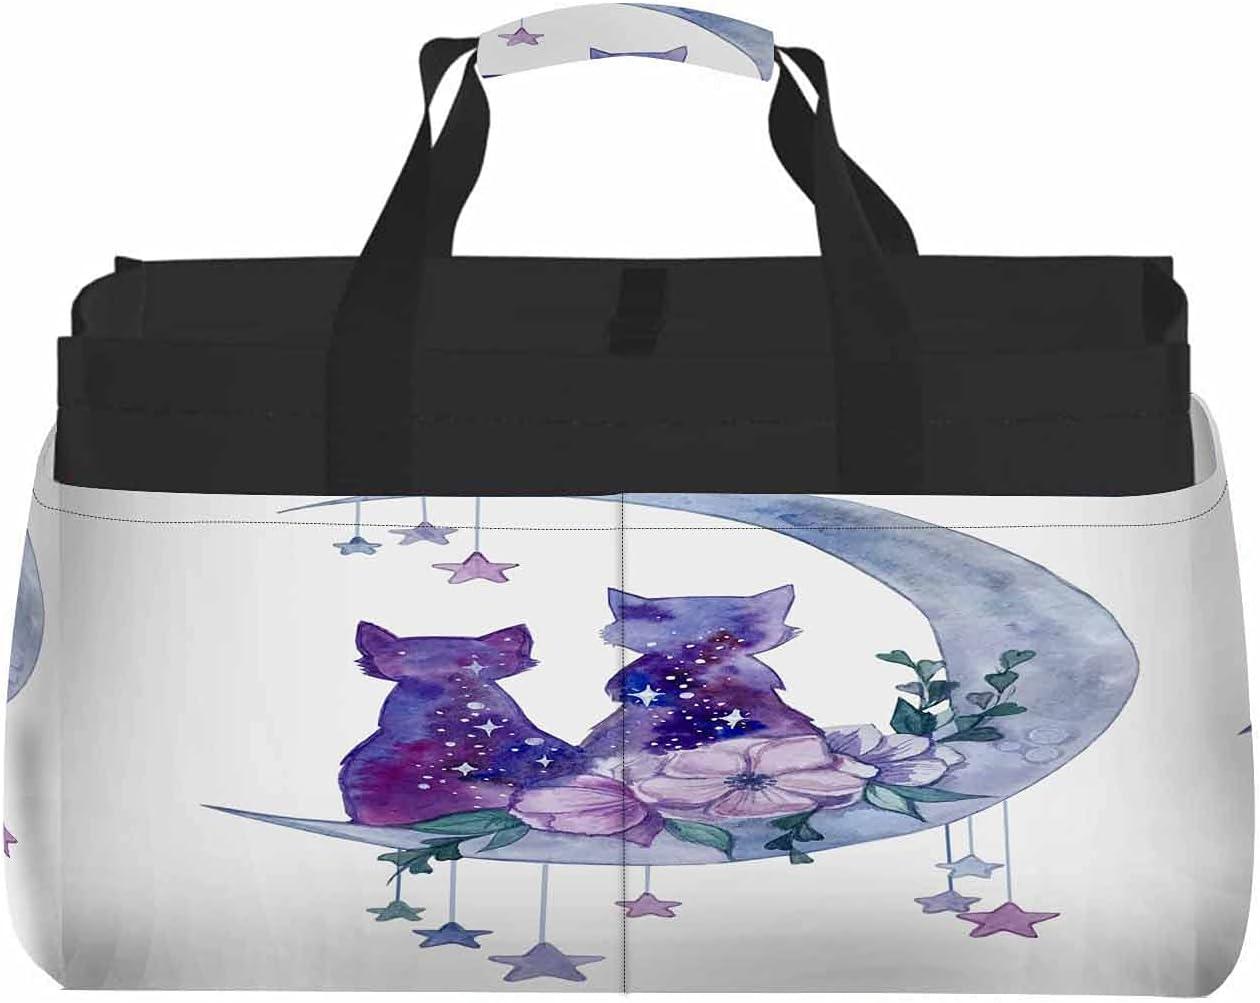 Nicokee Large Capacity Portable Storage Cat Bag Award Super popular specialty store Couple Honeymoon